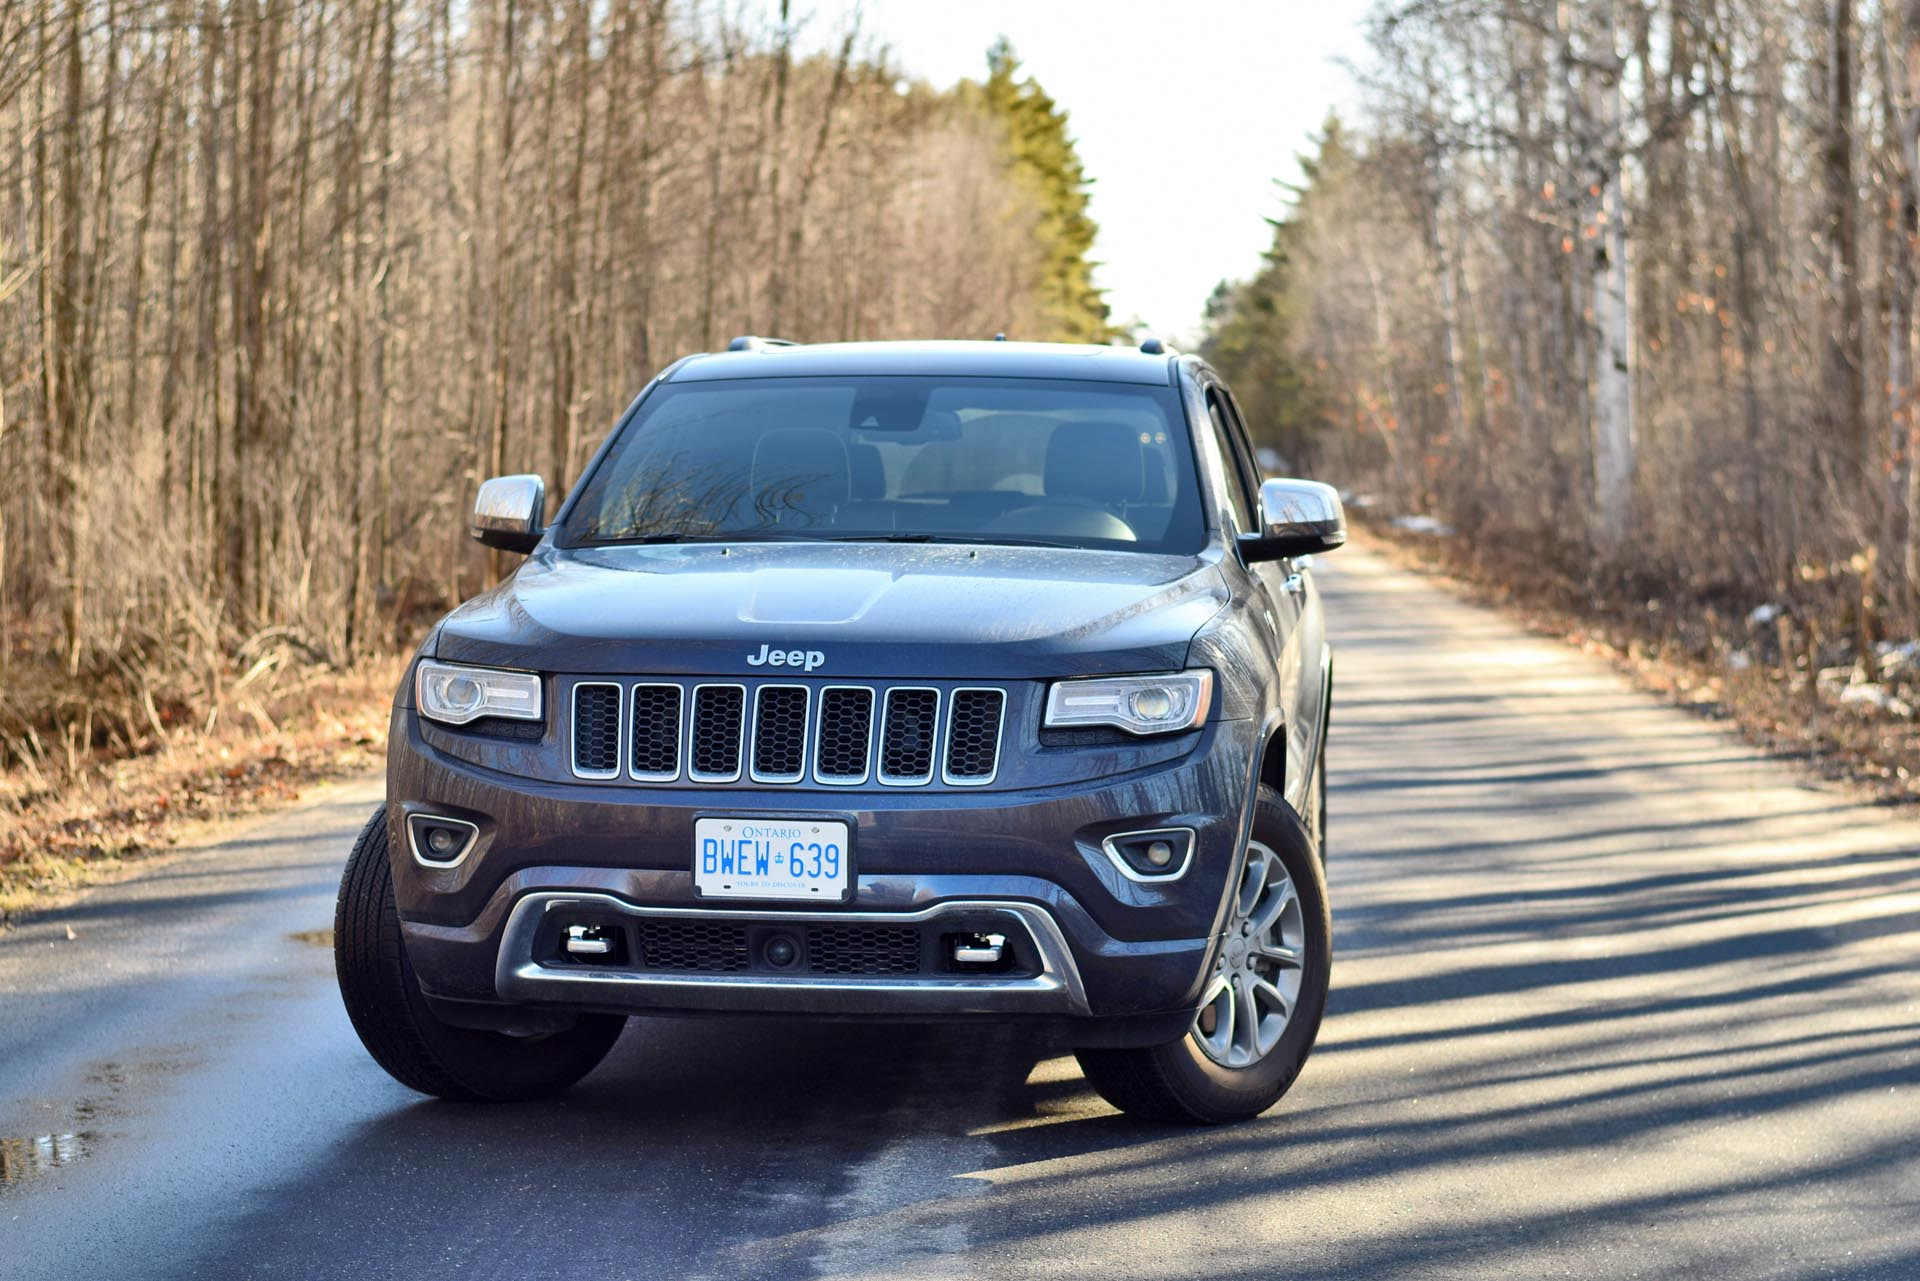 2015 Jeep Grand Cherokee Overland 4x4 EcoDiesel - Autos ca